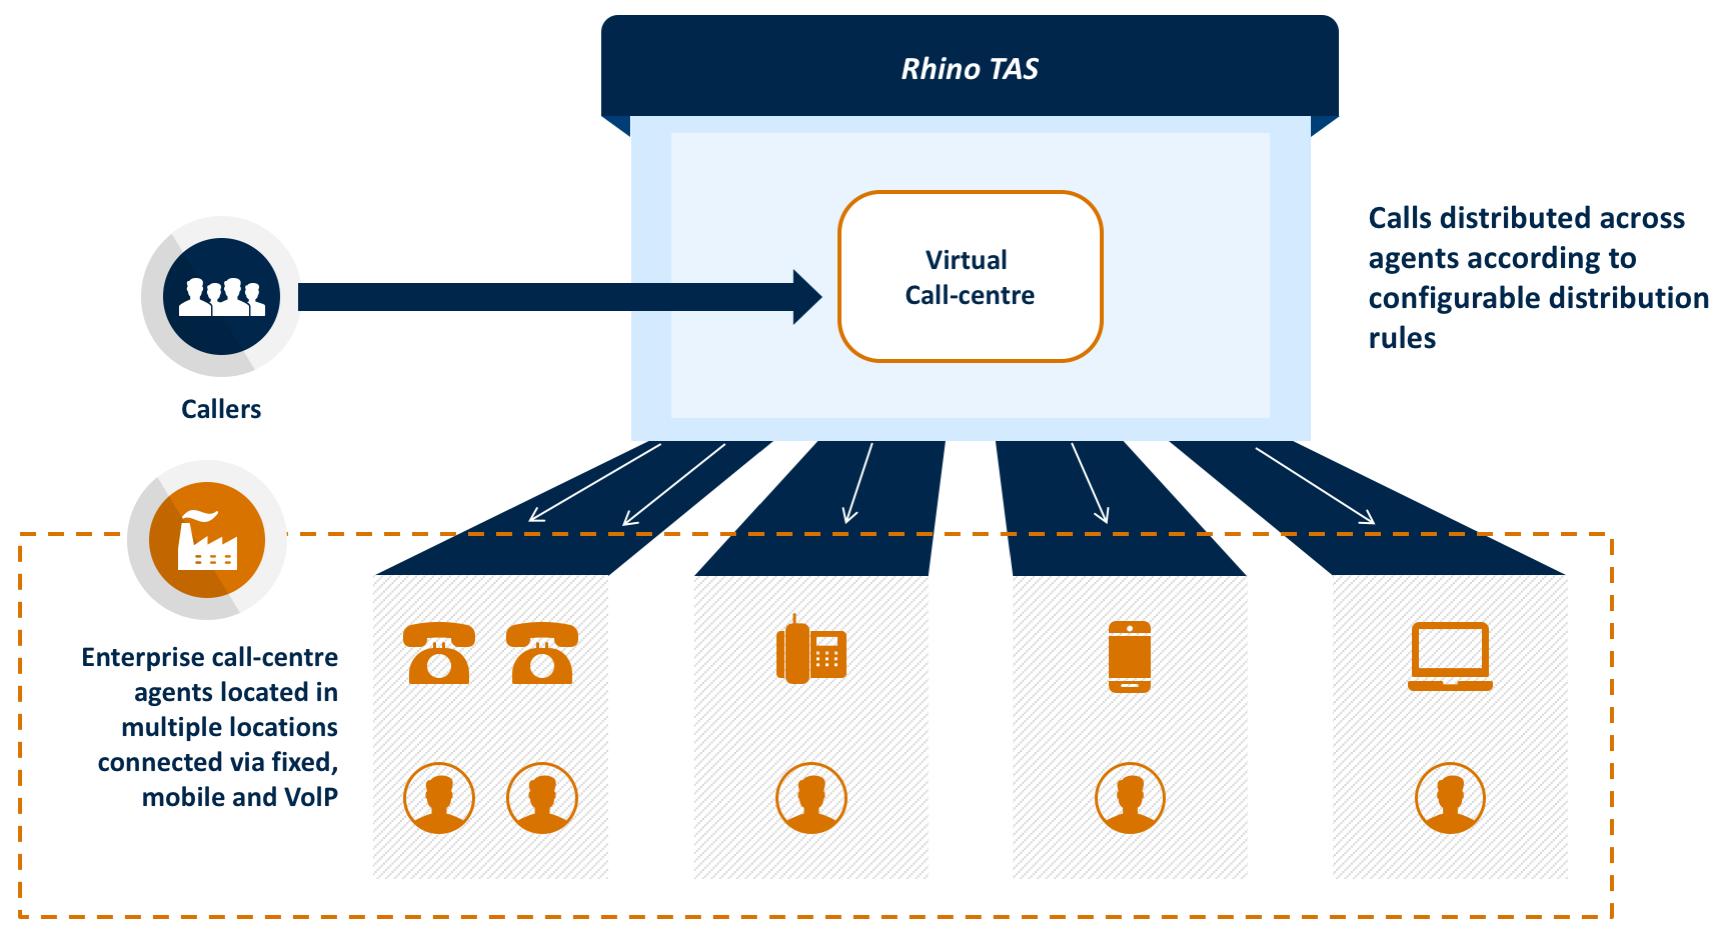 rhino-tas-app-virtual-call-centre